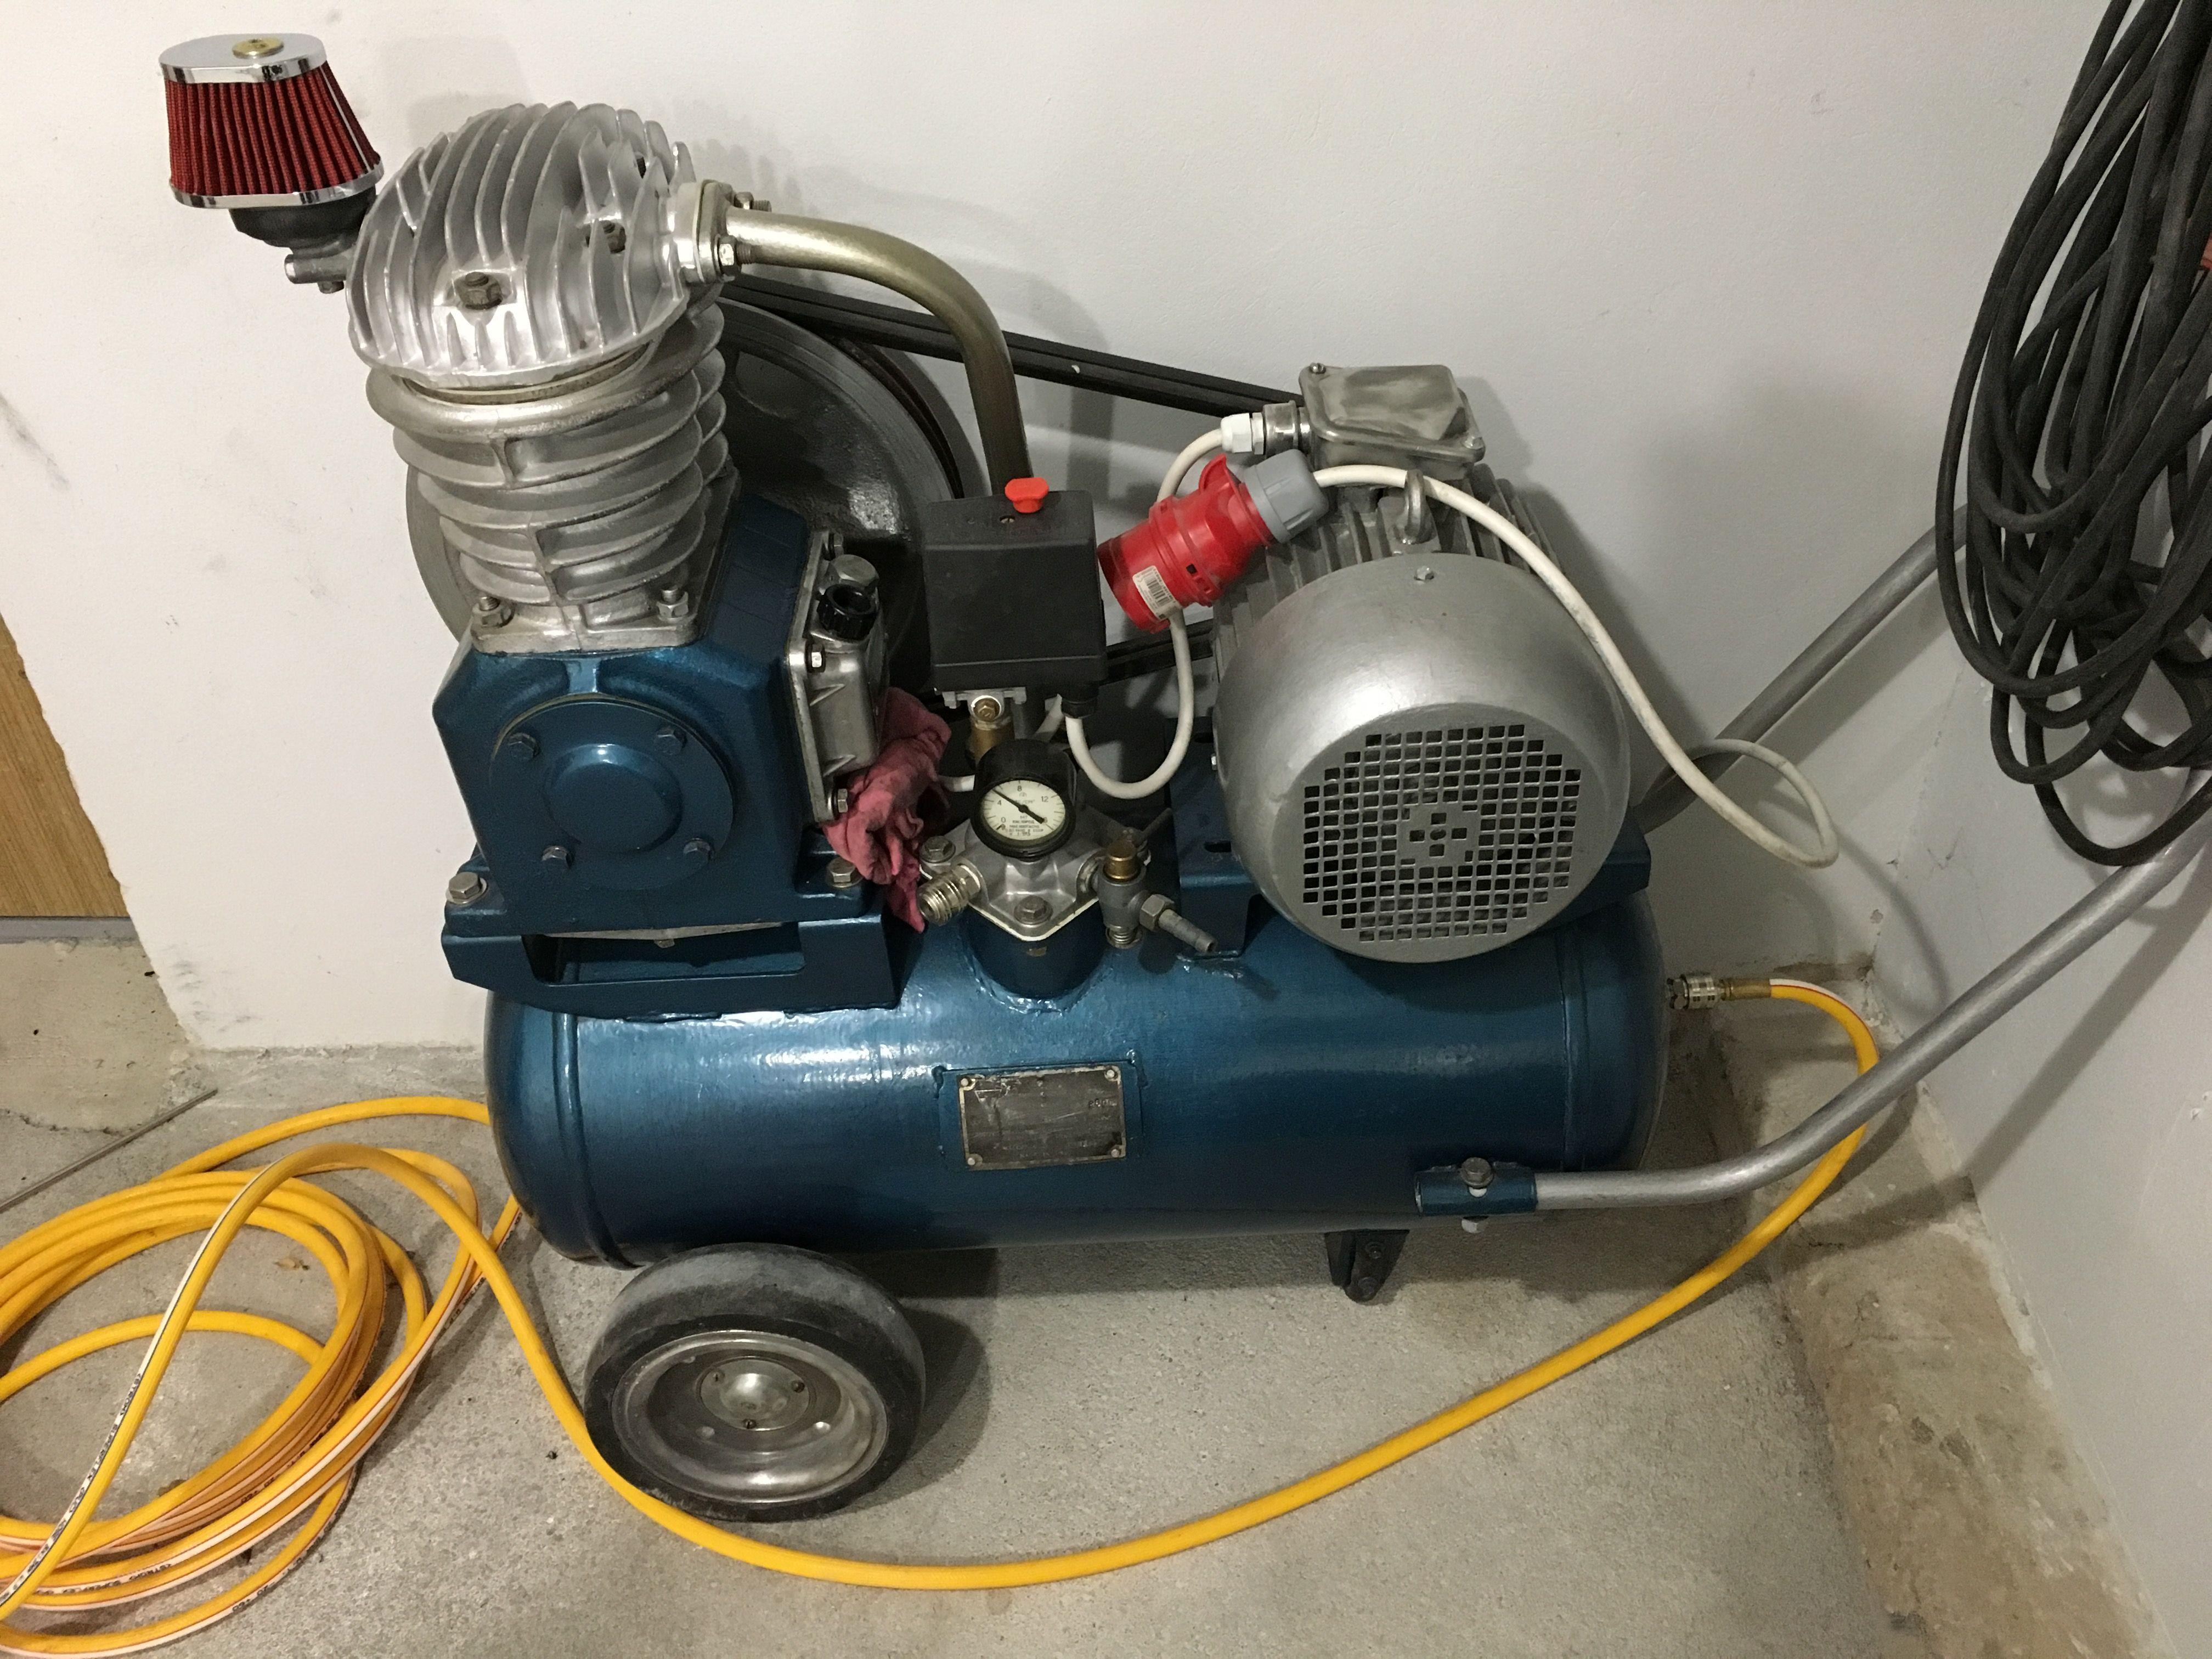 Compressor Co243 1990. Compressor